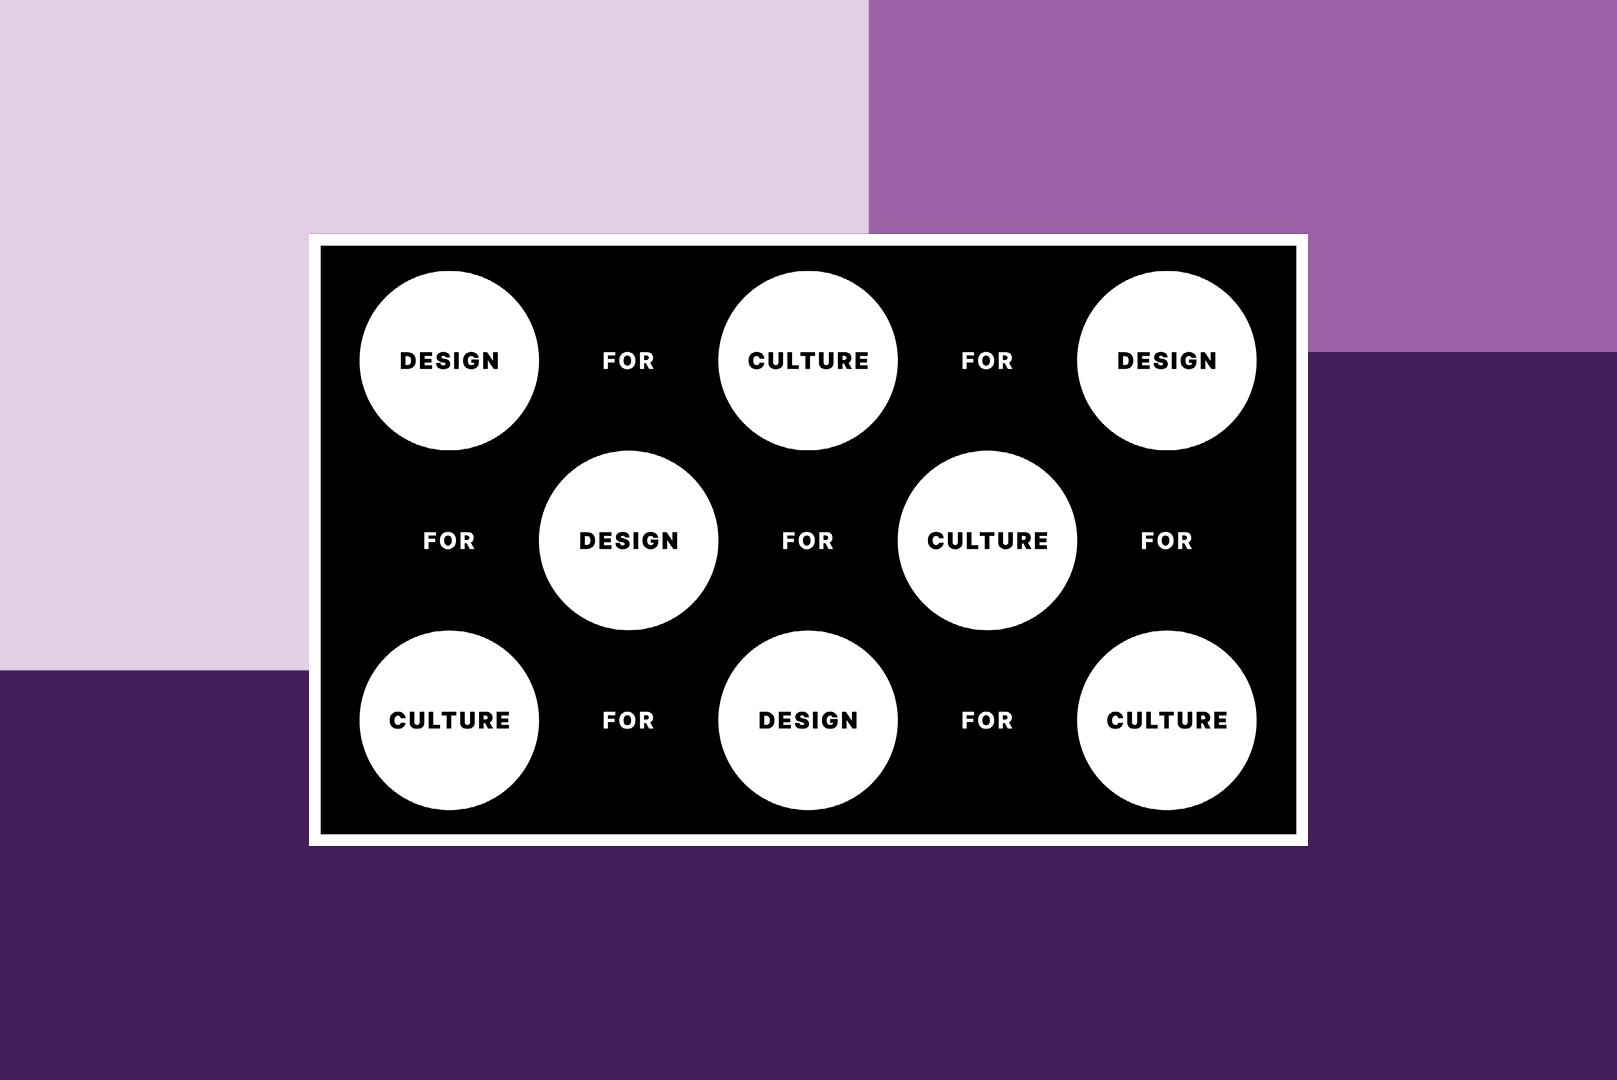 design for culture